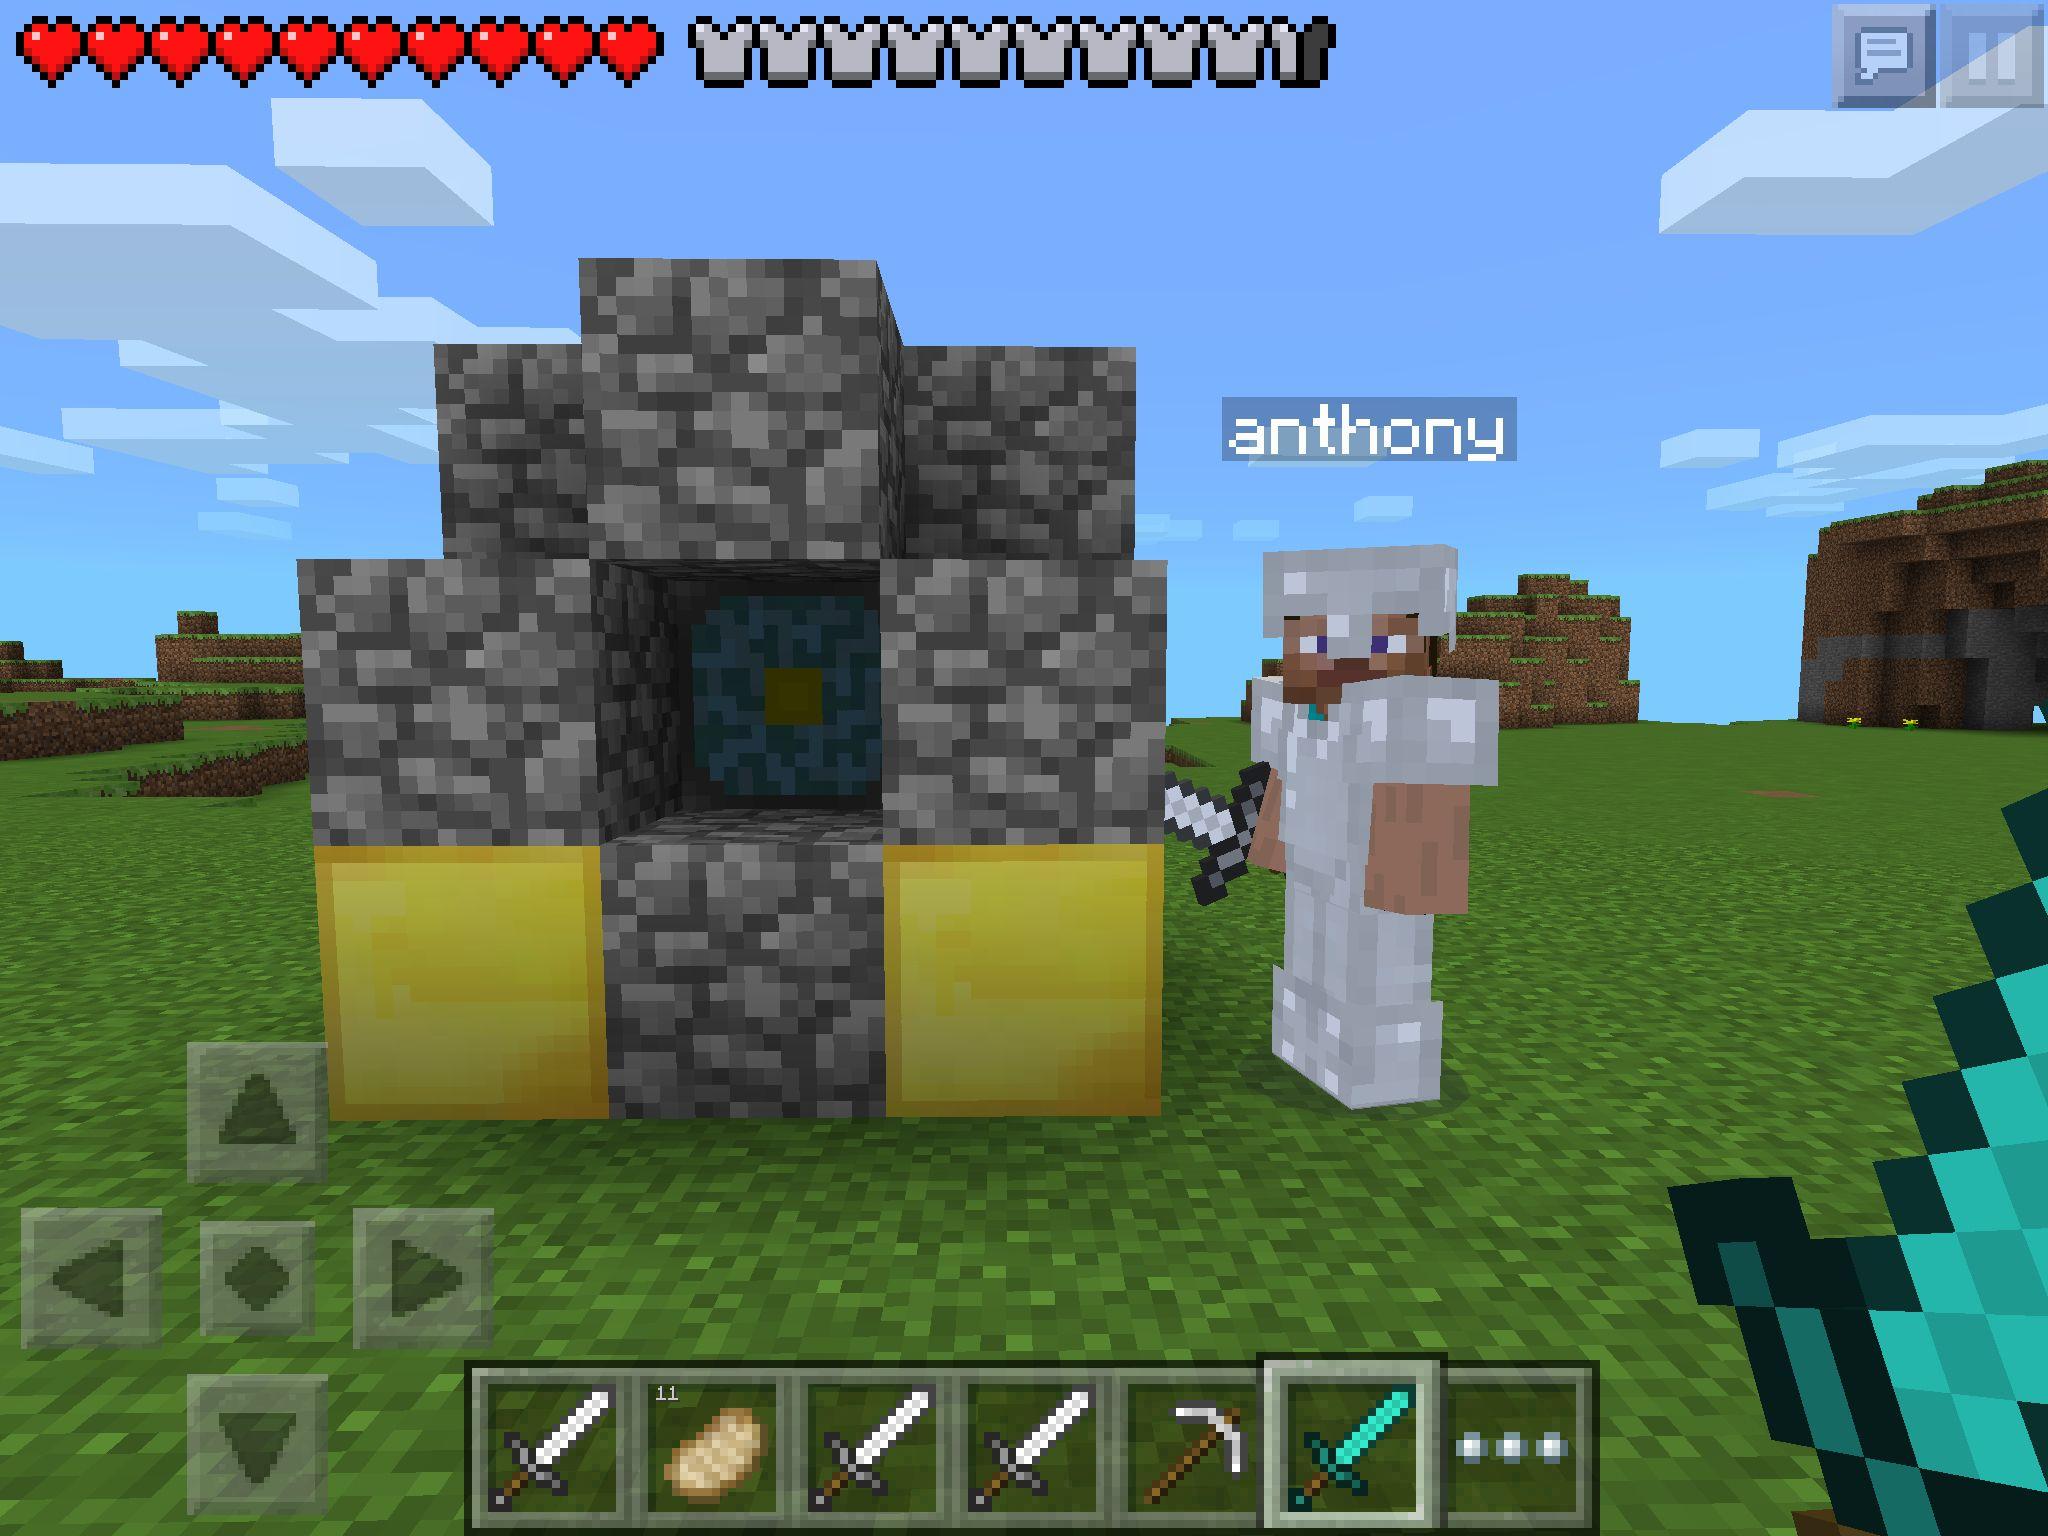 Download Wallpaper Minecraft Ios - f8bf55e675a4cc318fc04227d5bddfe6  Picture_22960.jpg